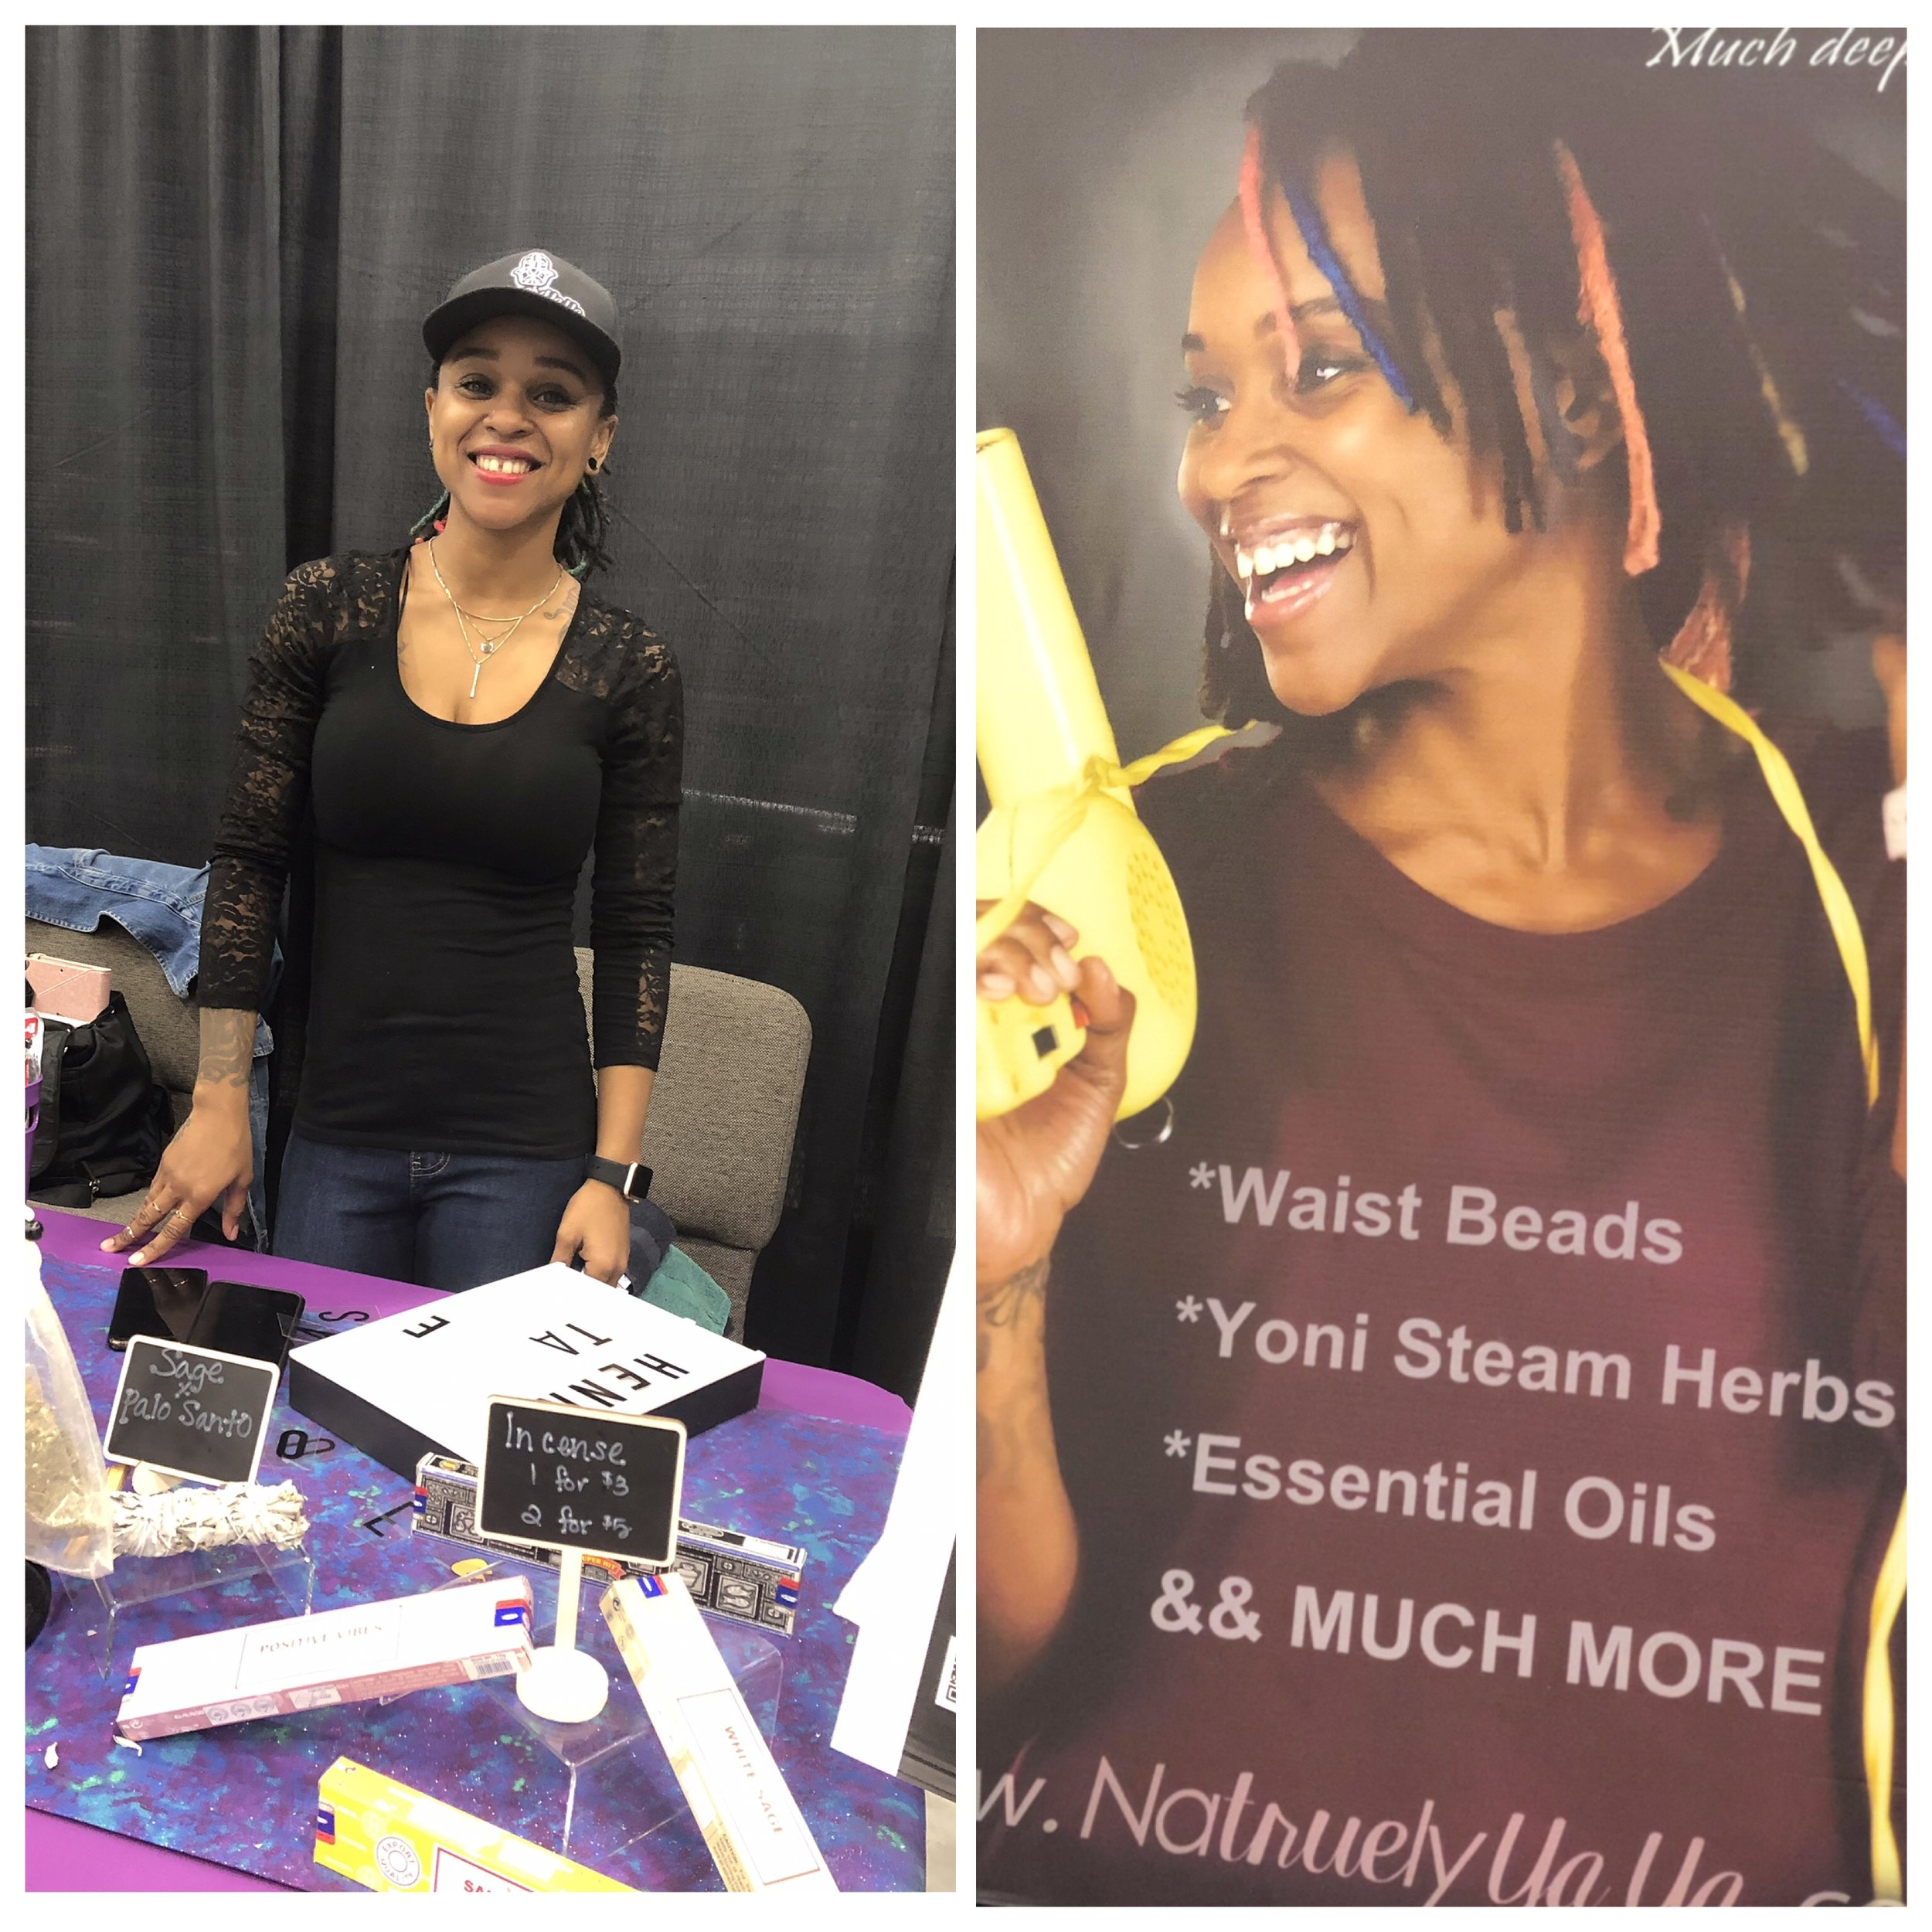 - Meet Yaya of NatruelyYaya. She's a licensed cosmetoloigst, certified reike healer, and sells handmade waistbeads. Check out her work on IG @natruelyyaya!